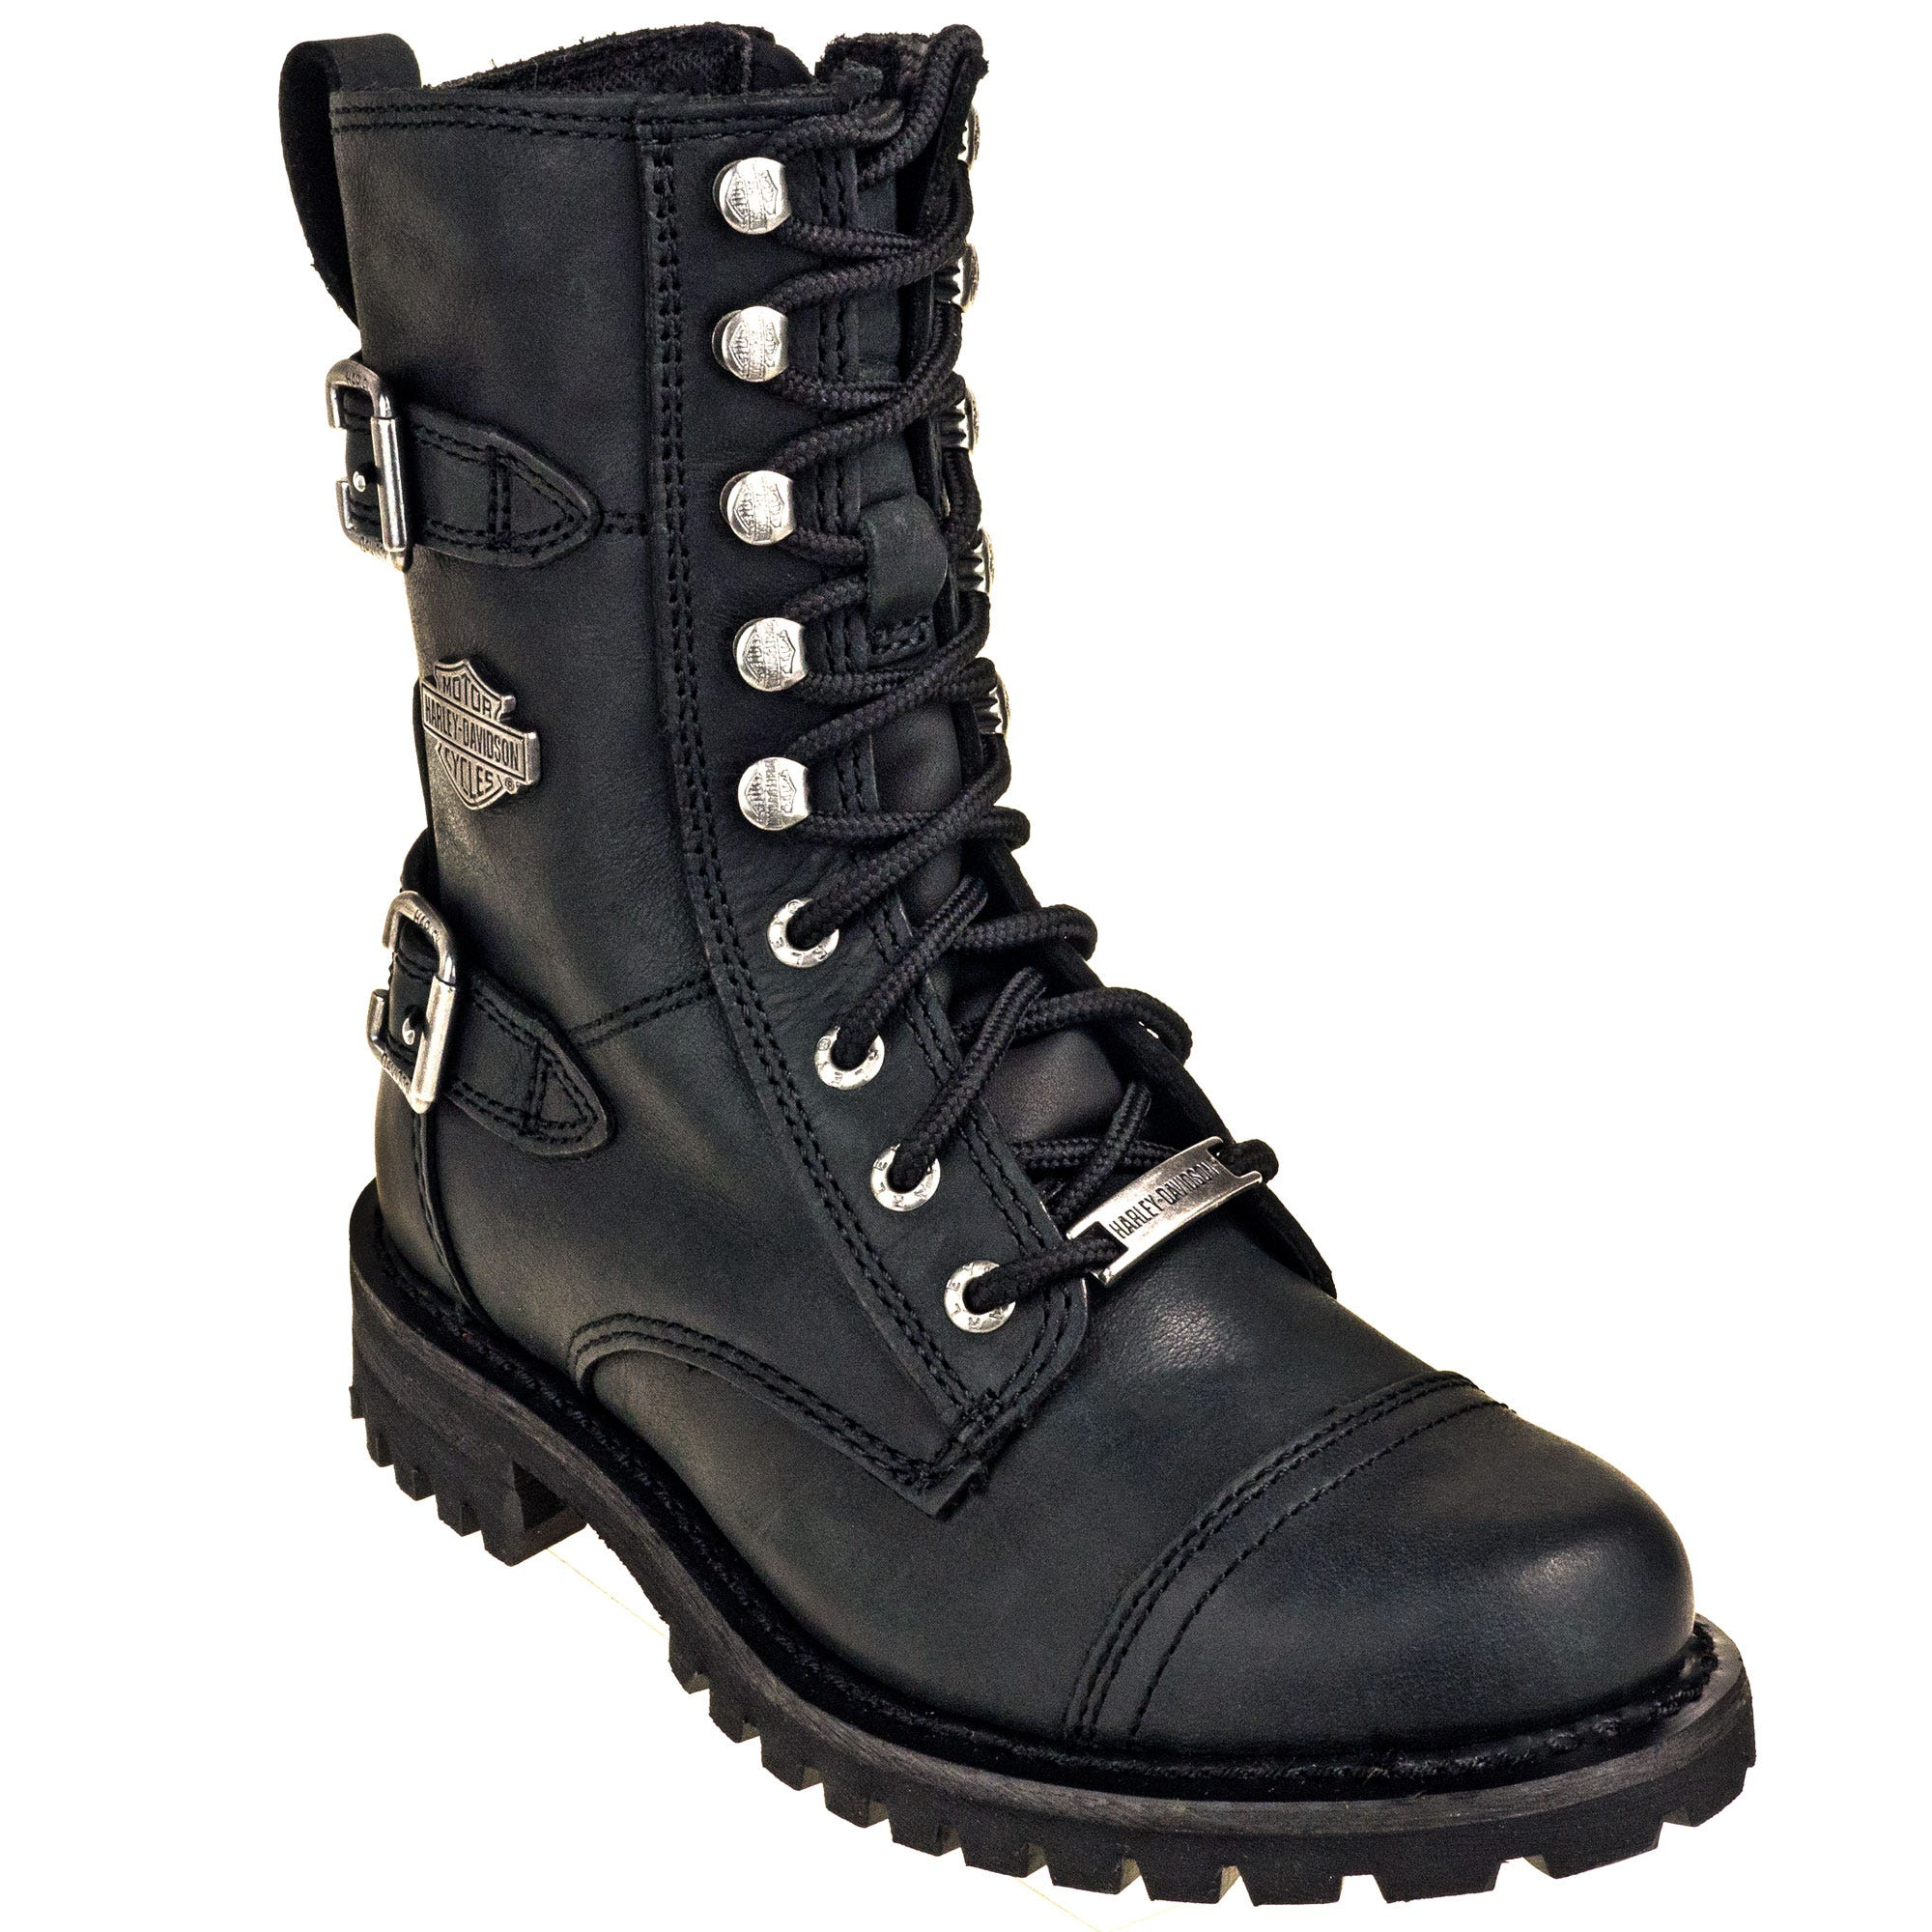 Harley Davidson 83853 Side Zip Women's Black Balsa Motorcycle Boots